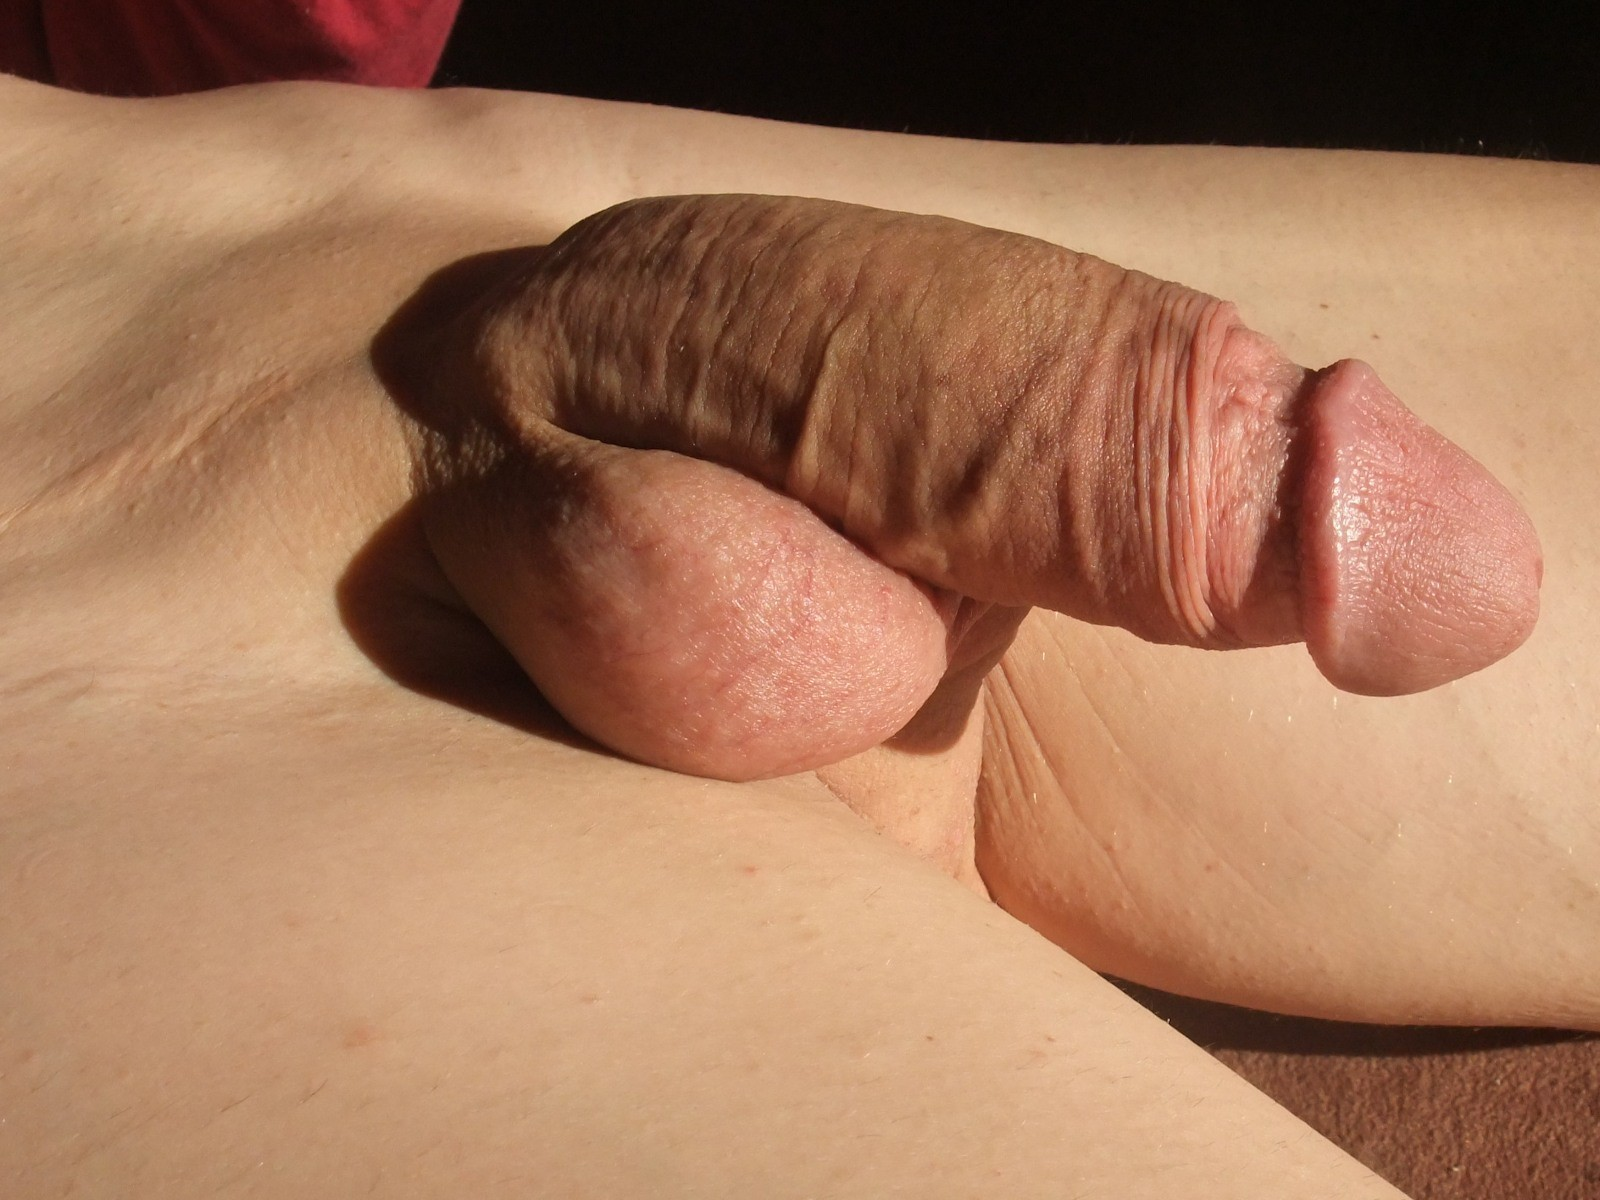 blackedraw blonde trophy wife cucks her husband with bbc #uncut #softcock #cock #penis #hangingcock #hangingballs #balls #outdoors #darkhair #closeup #cockpic #suckable #schwanz #bareballs